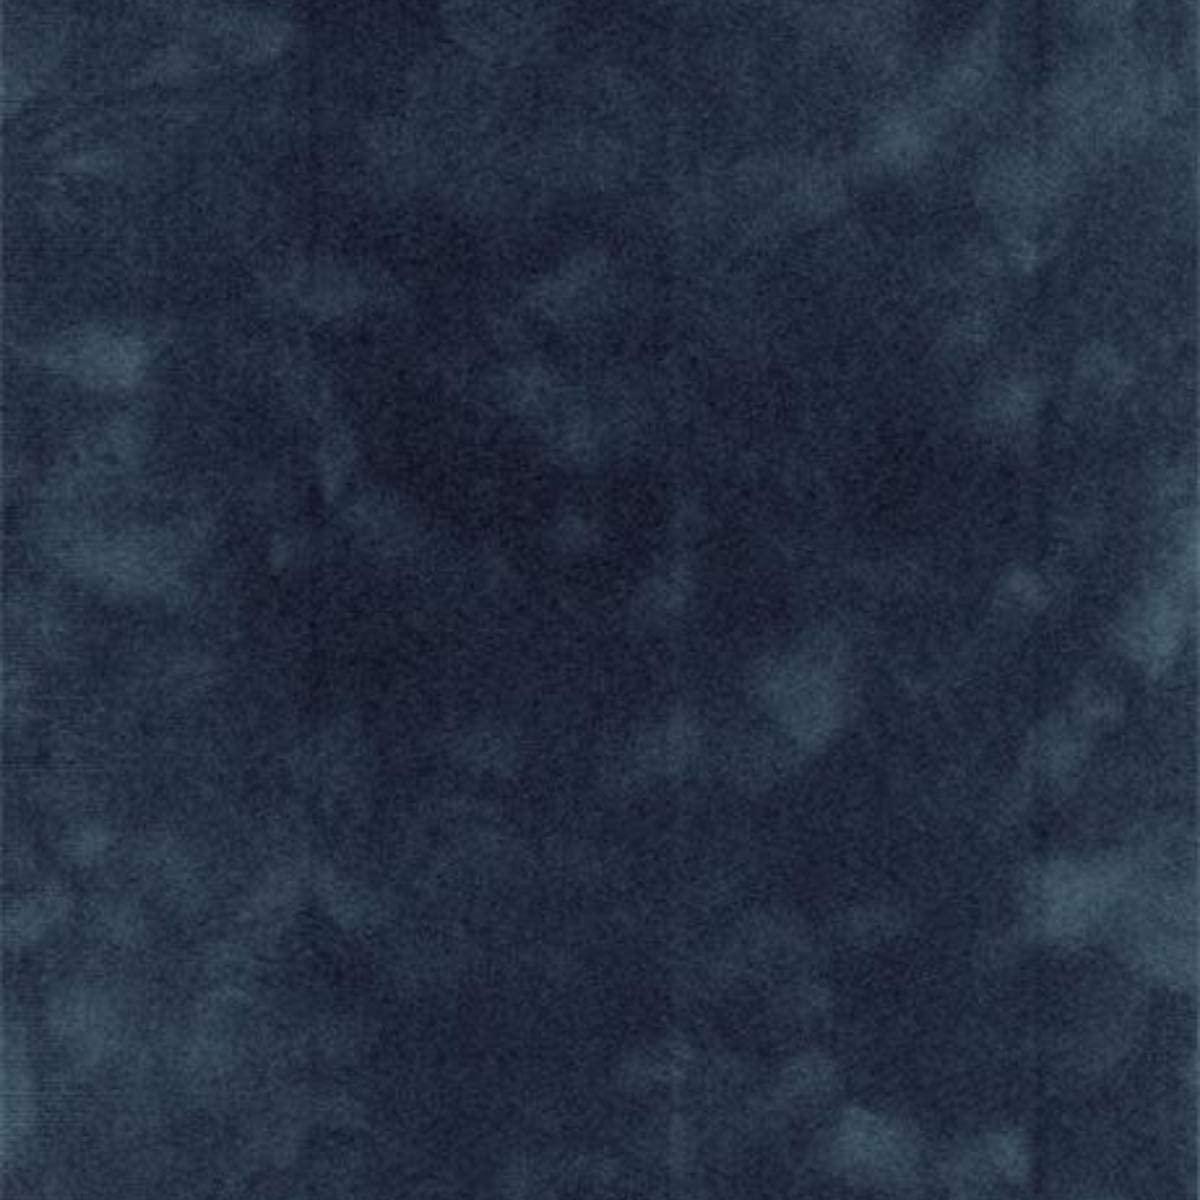 SuedePaper 25 Sheets (12 x 12)- The Original Luxurious Velvet Paper (Ocean)